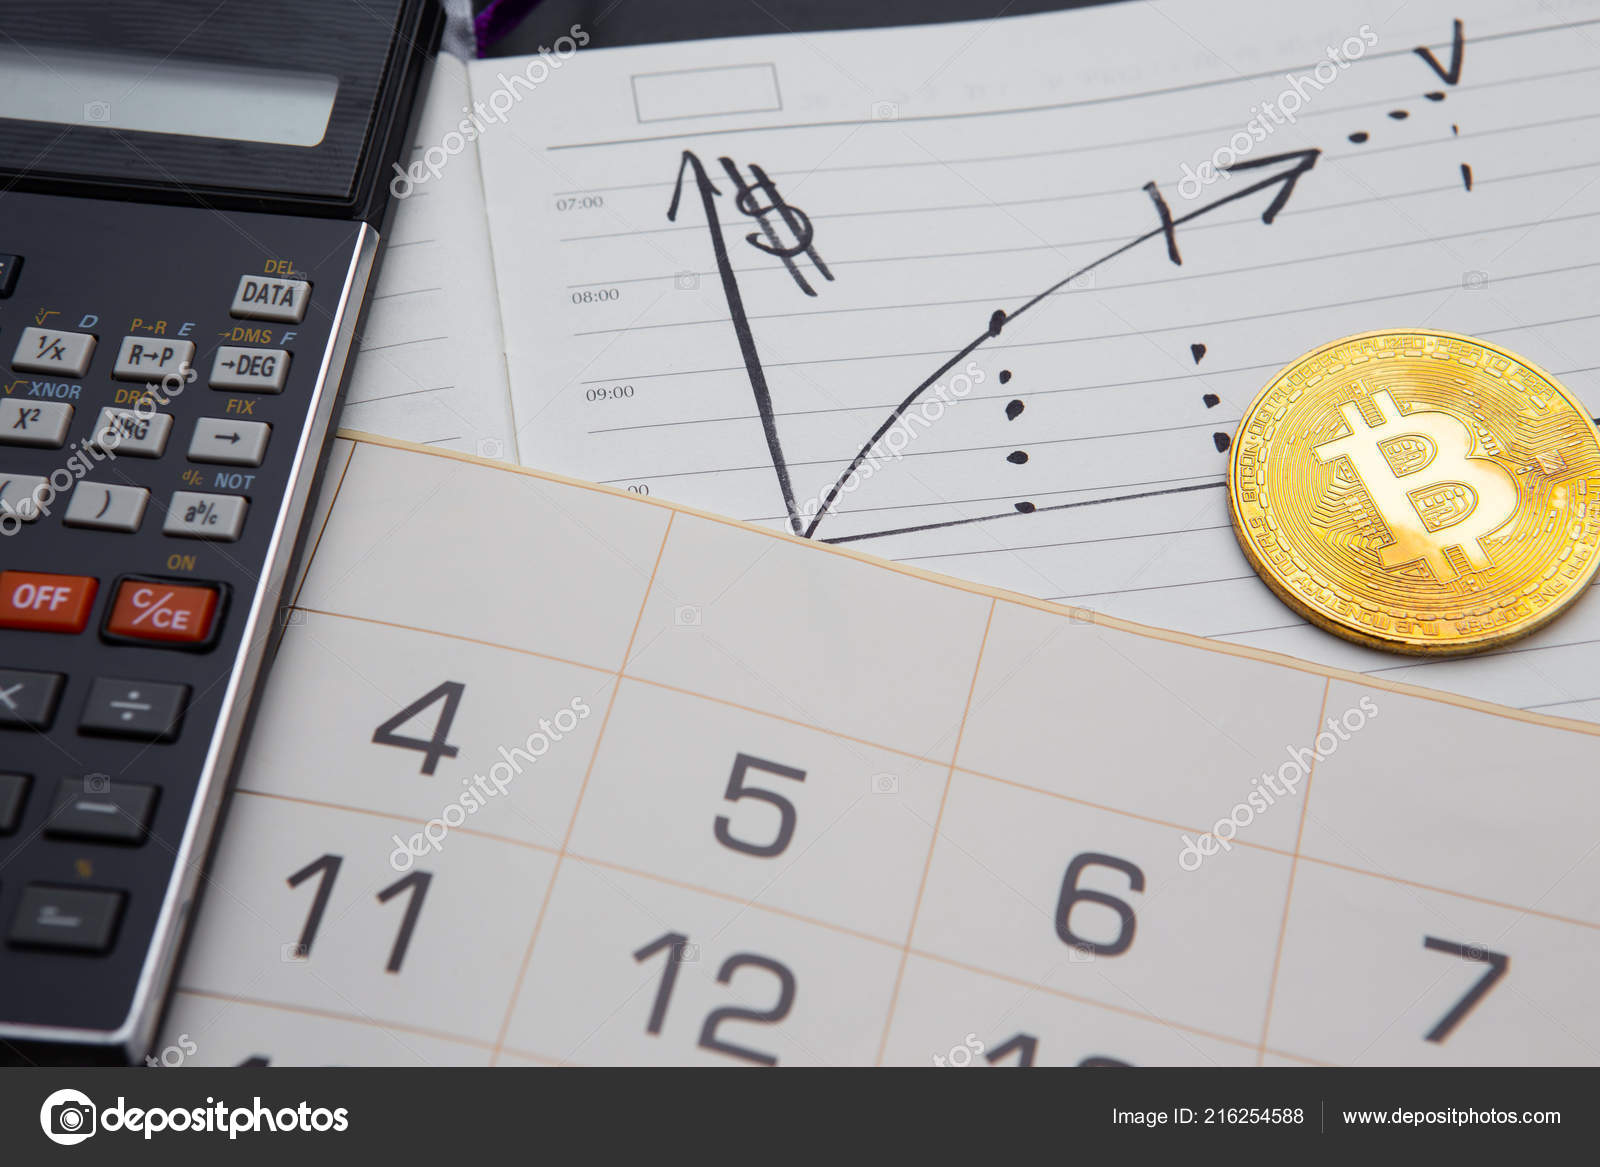 bitcoin efficiency calculator